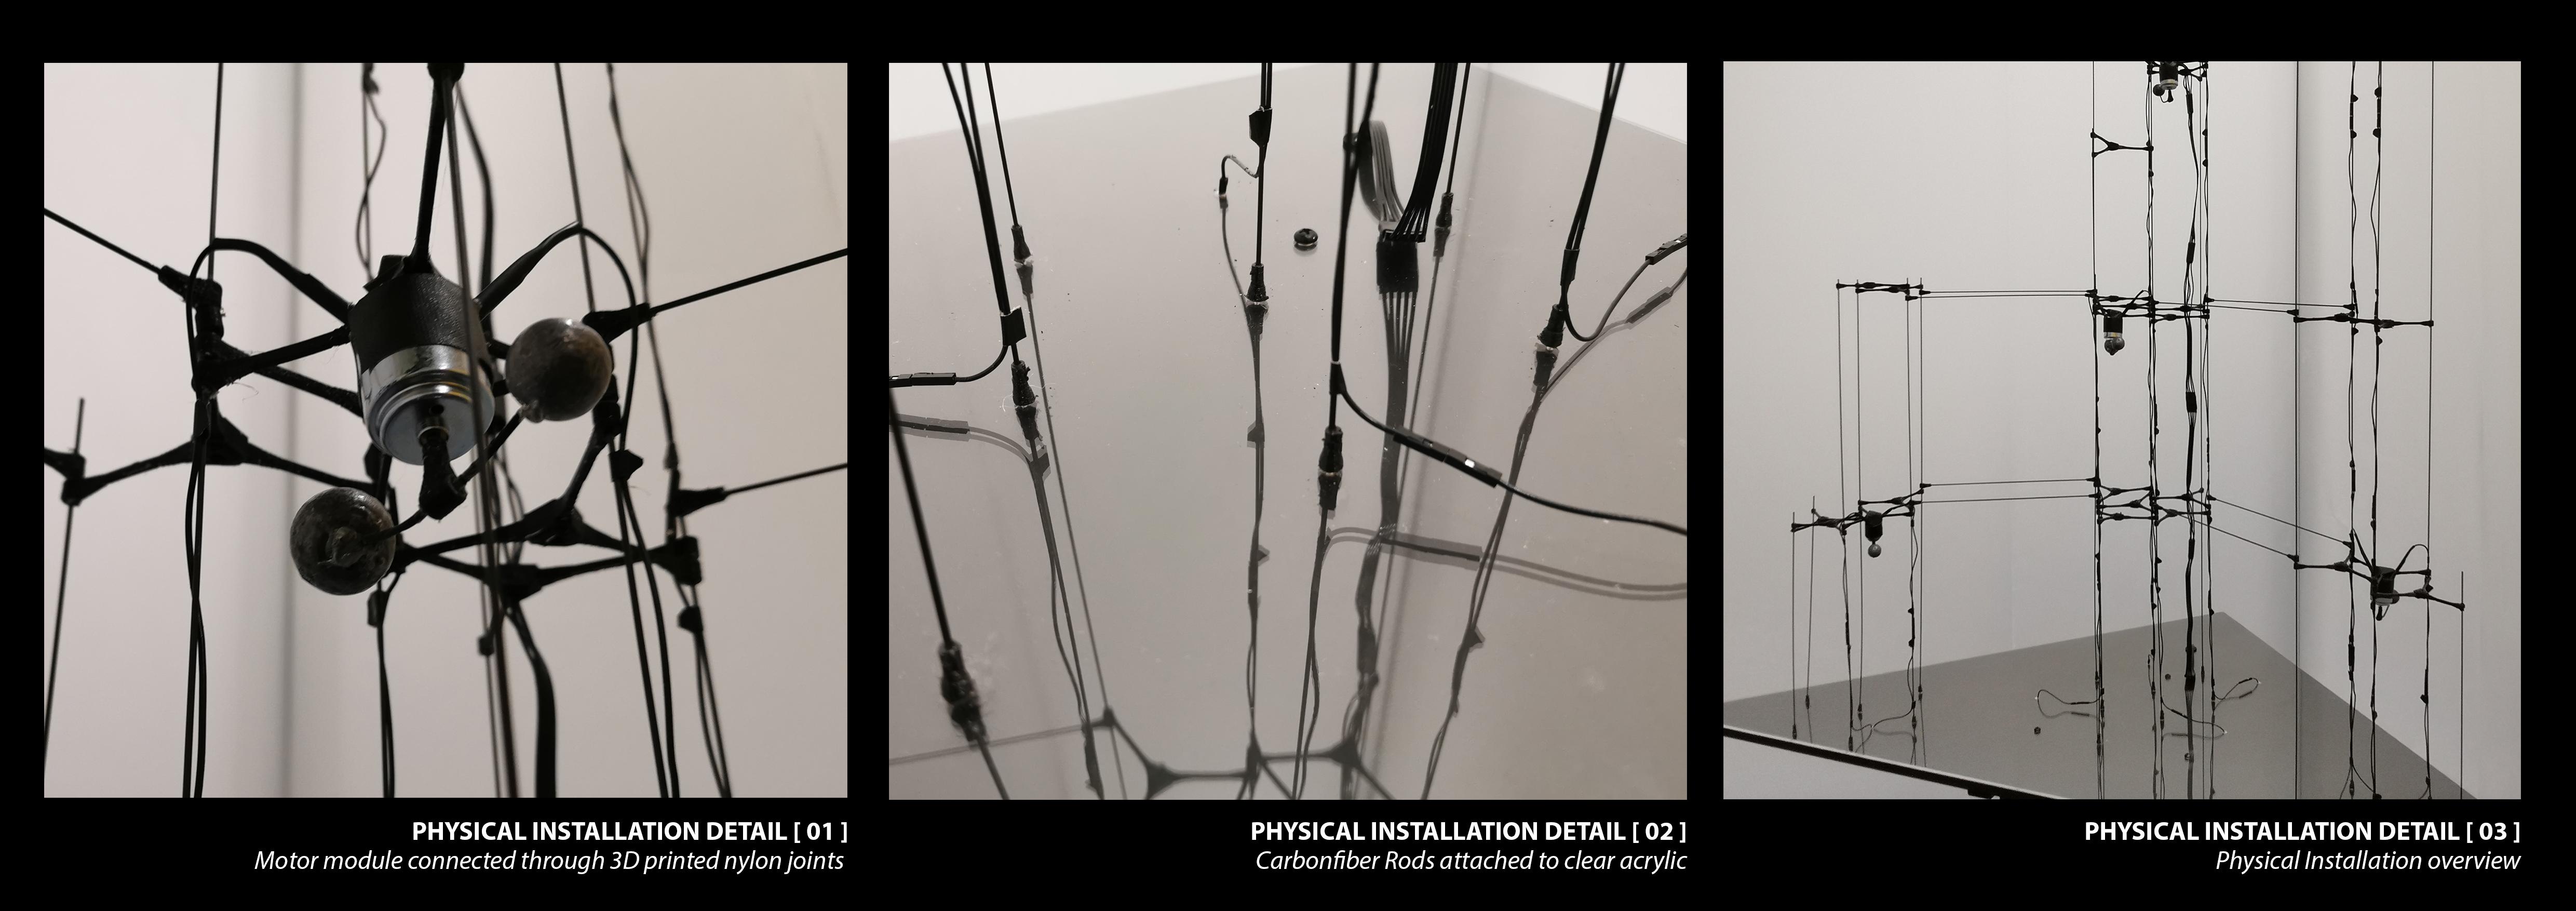 Physical_model